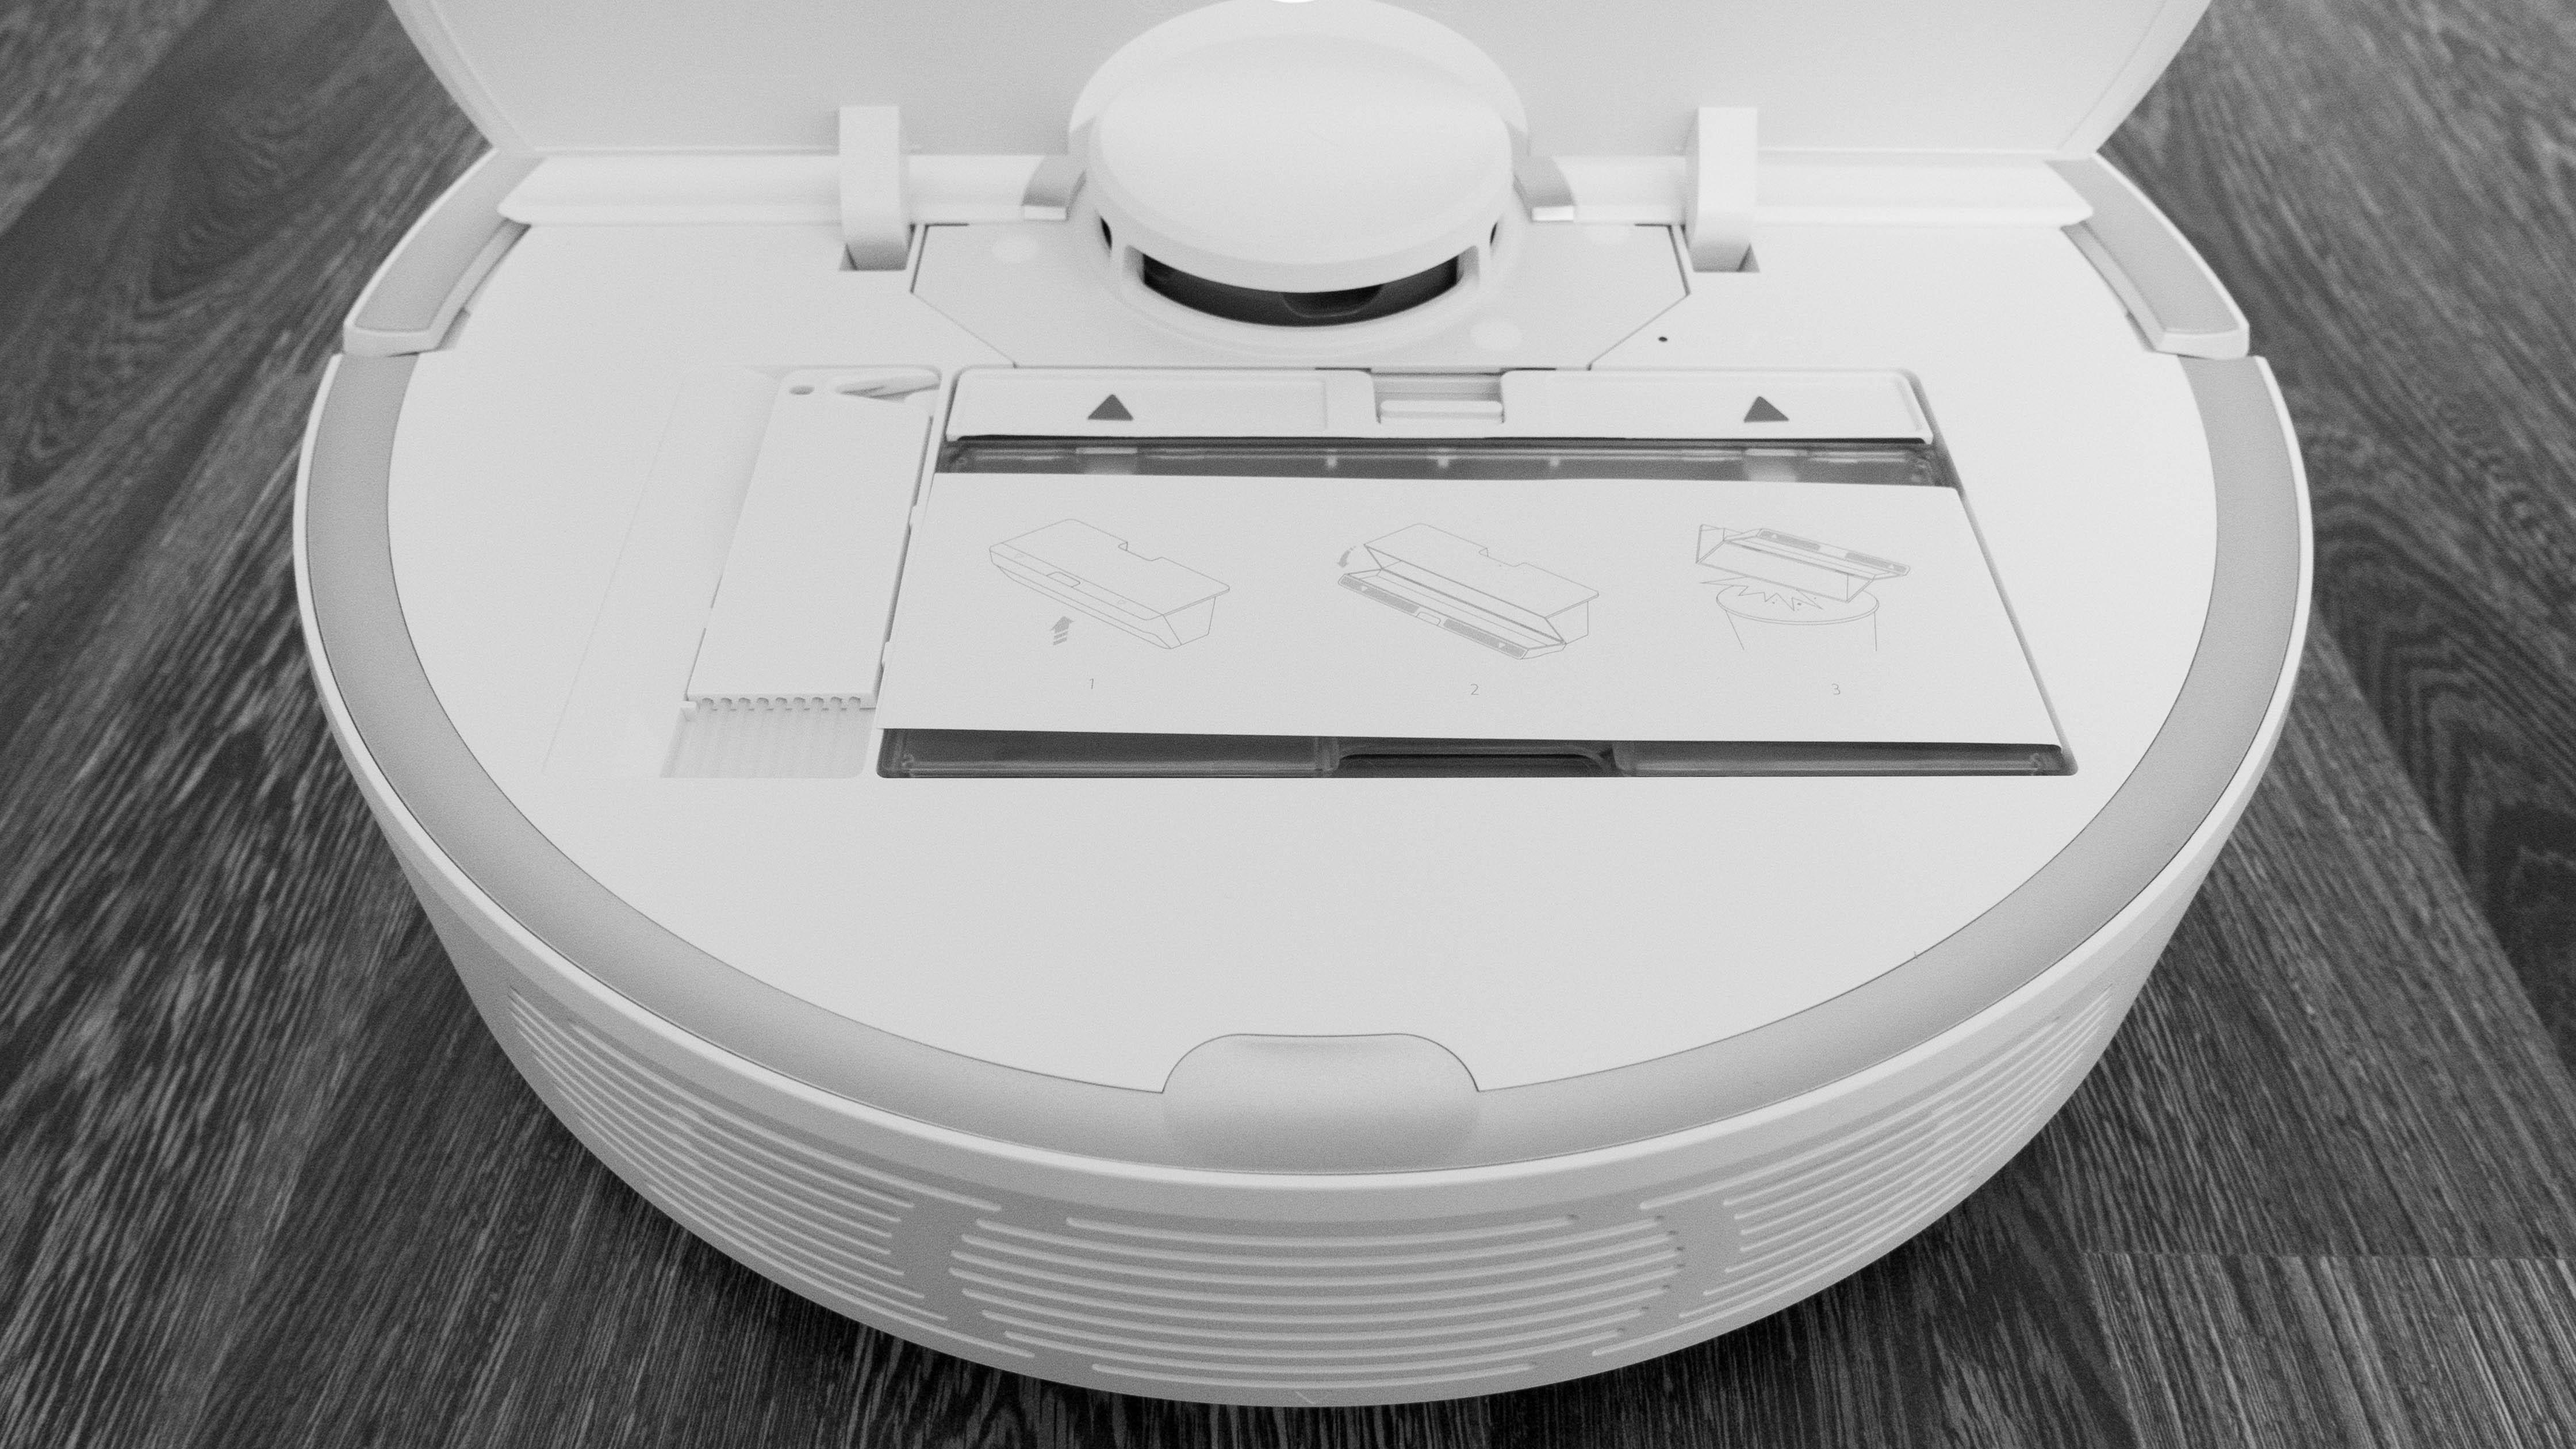 Xiaomi Mi Robot 2 Roborock S50 Roboter Details 19